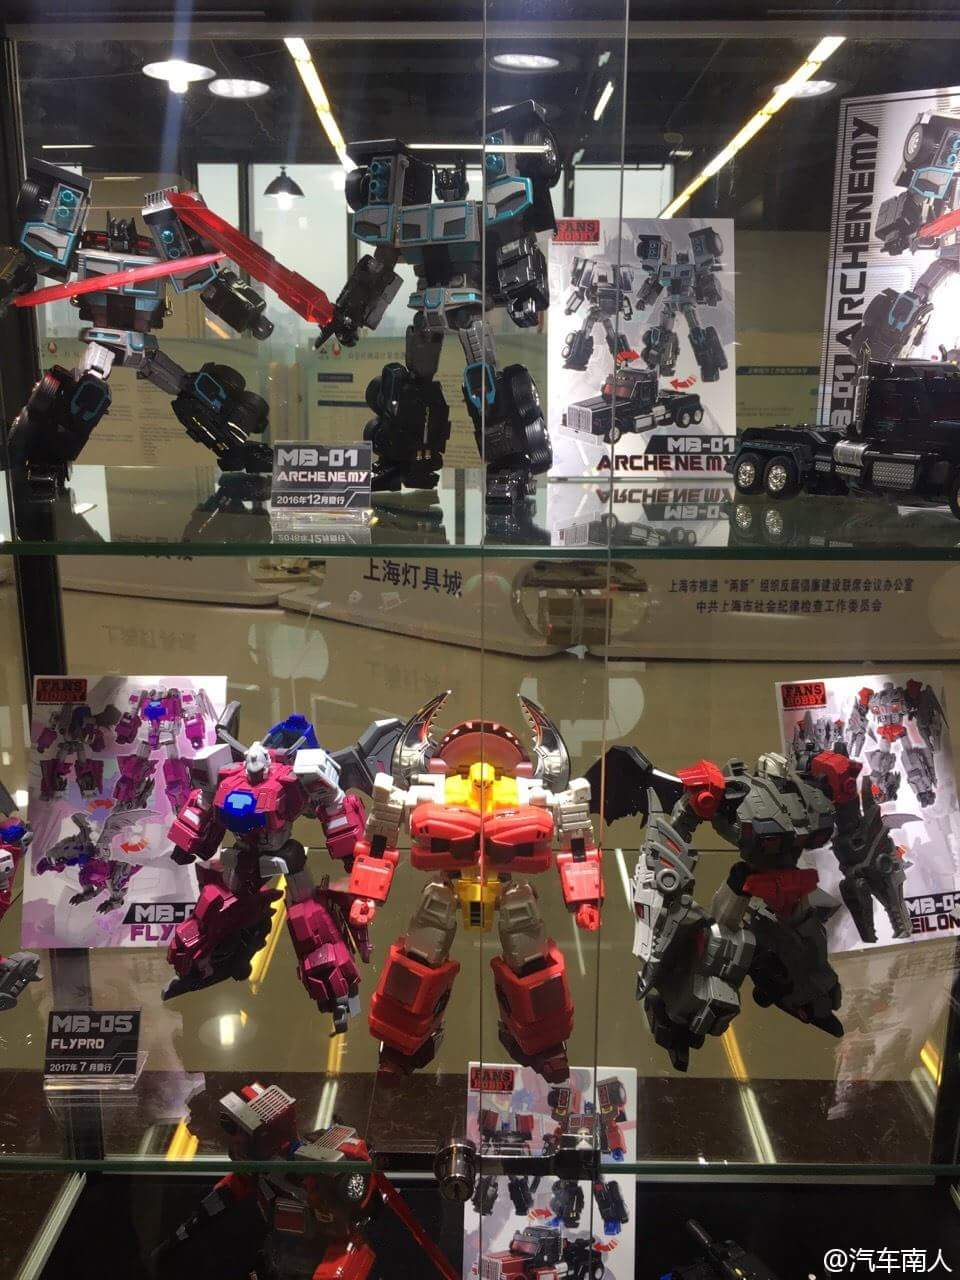 [FansHobby] Produit Tiers - Master Builder MB-02/03/05 - aka Monsterbots/Monstrebots YrsYTRME